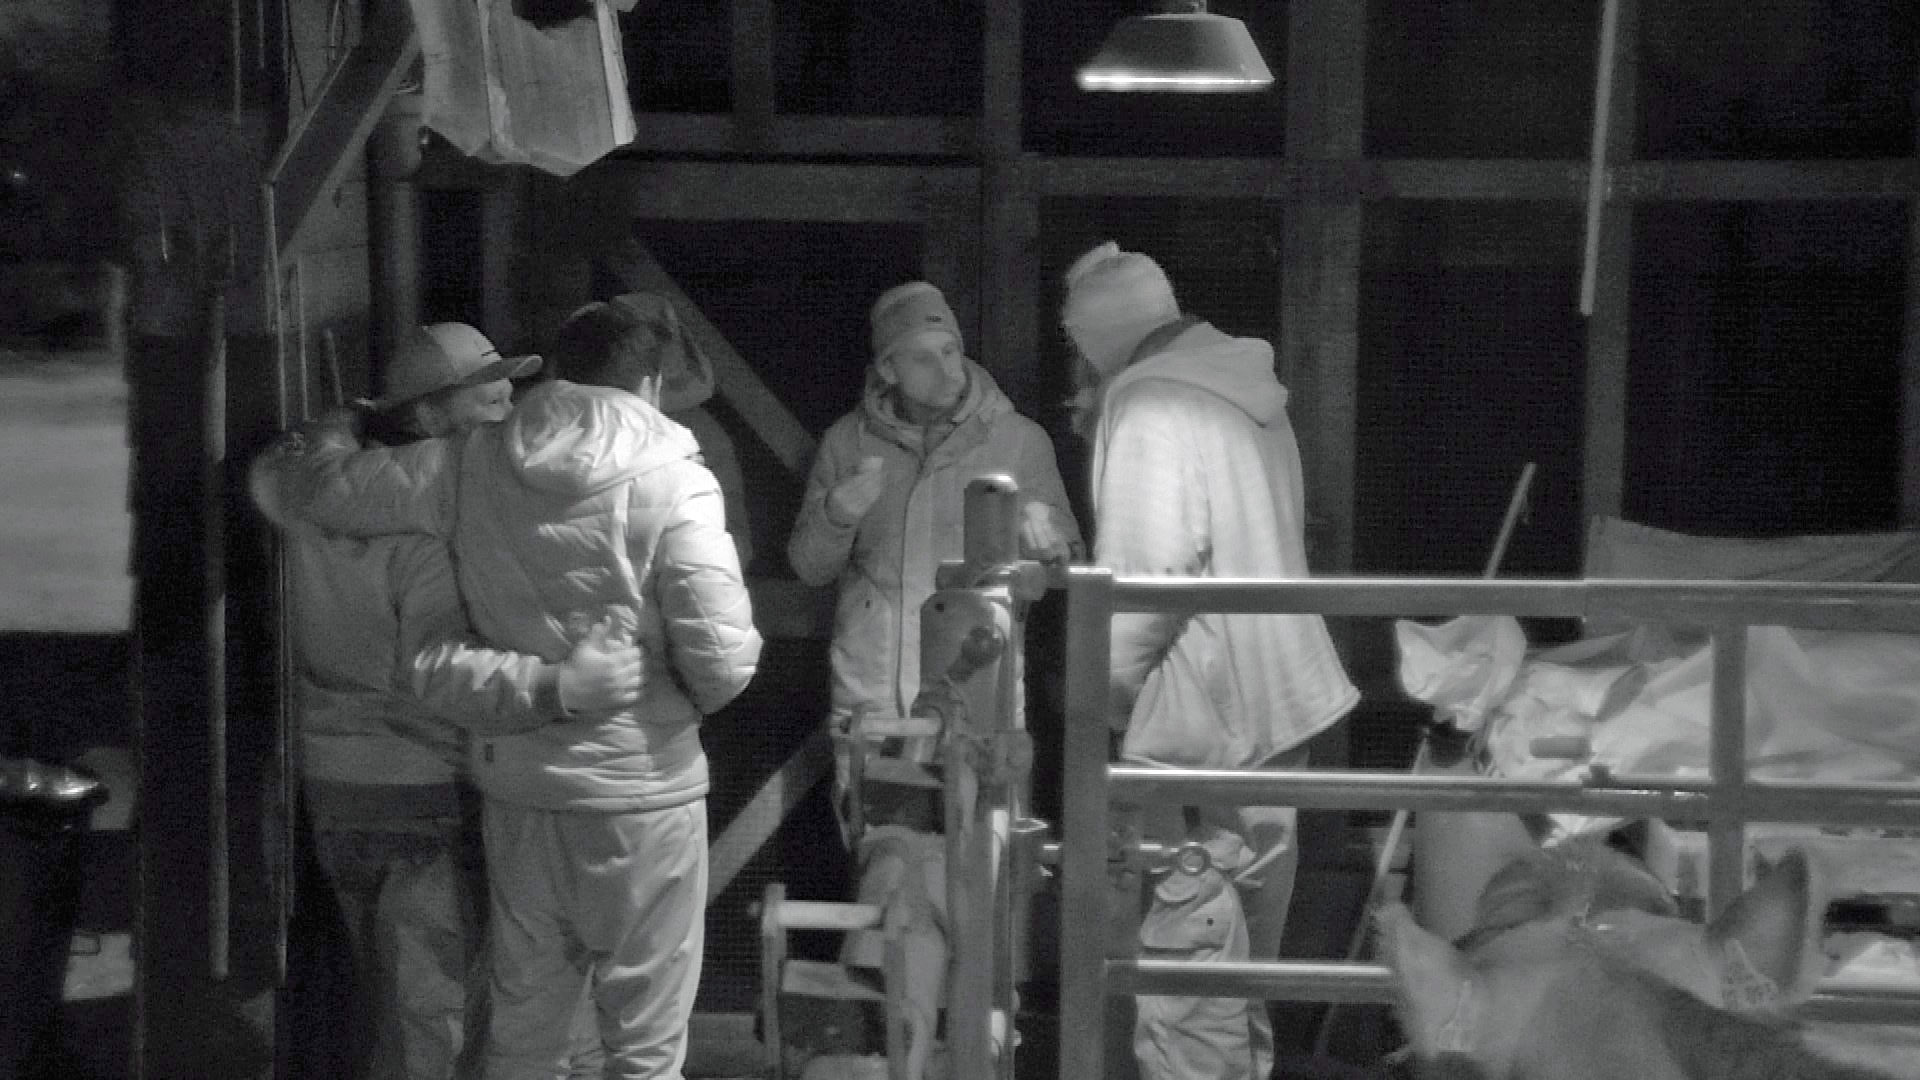 Newtopia Stall Wurst Verschwoerung Geheimnis Folge 23 25.03.2015